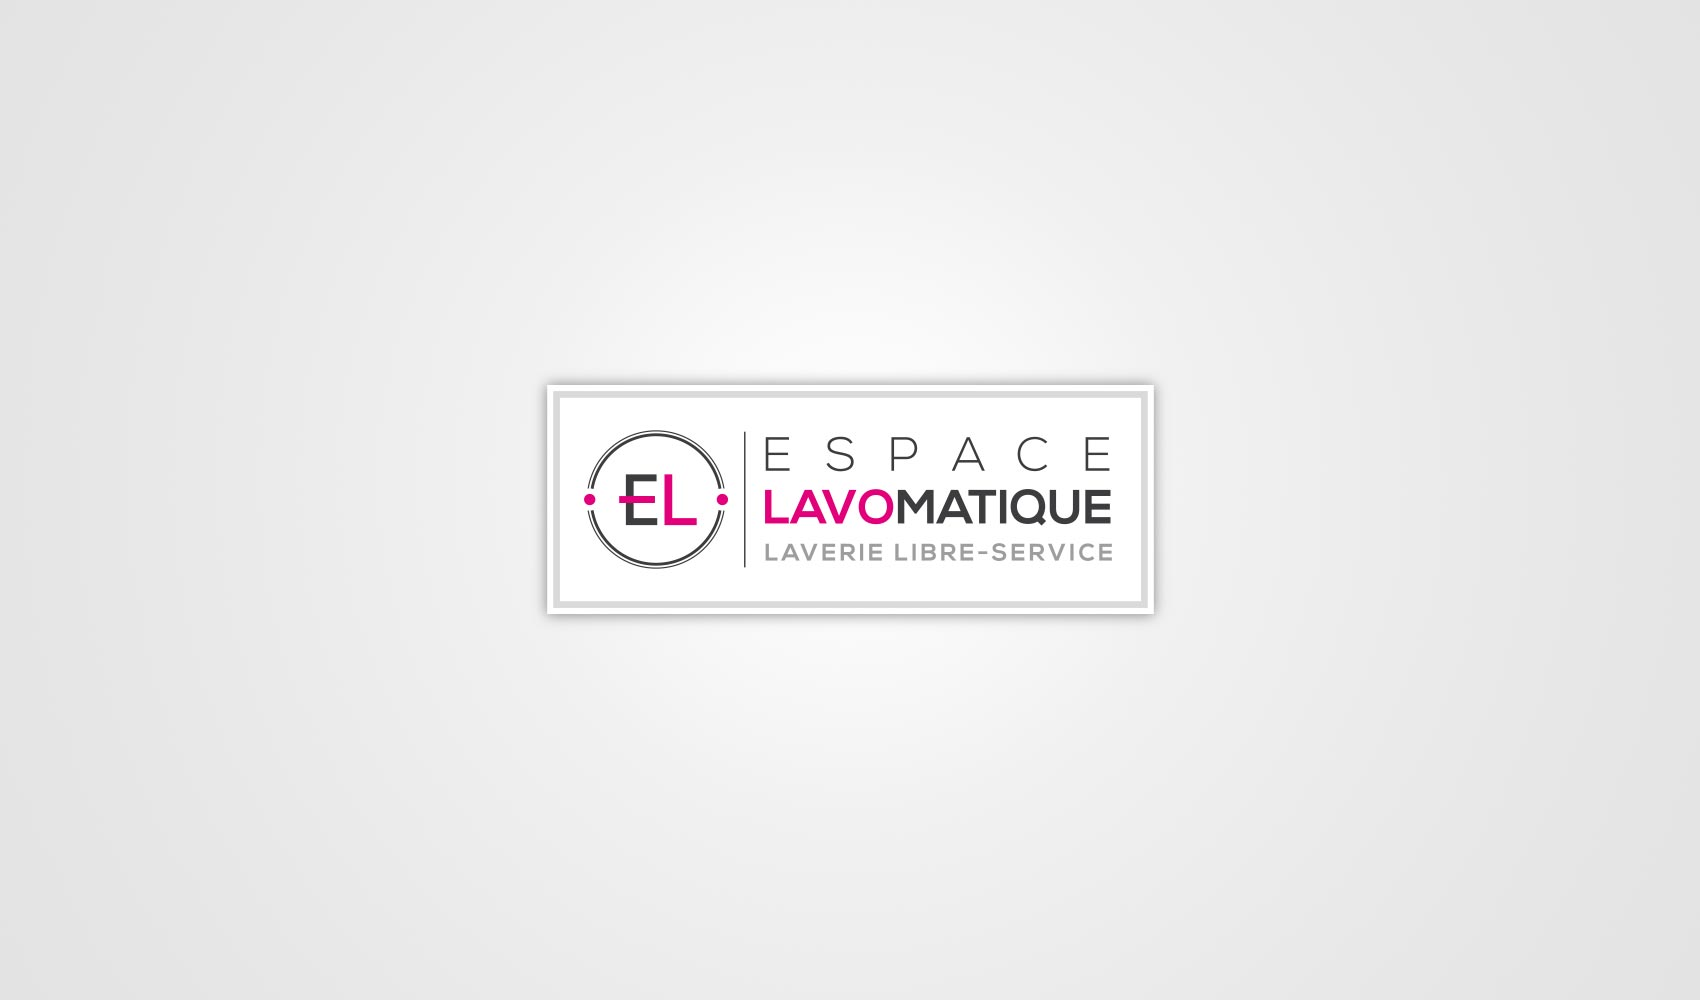 logo-espace-lavomatique